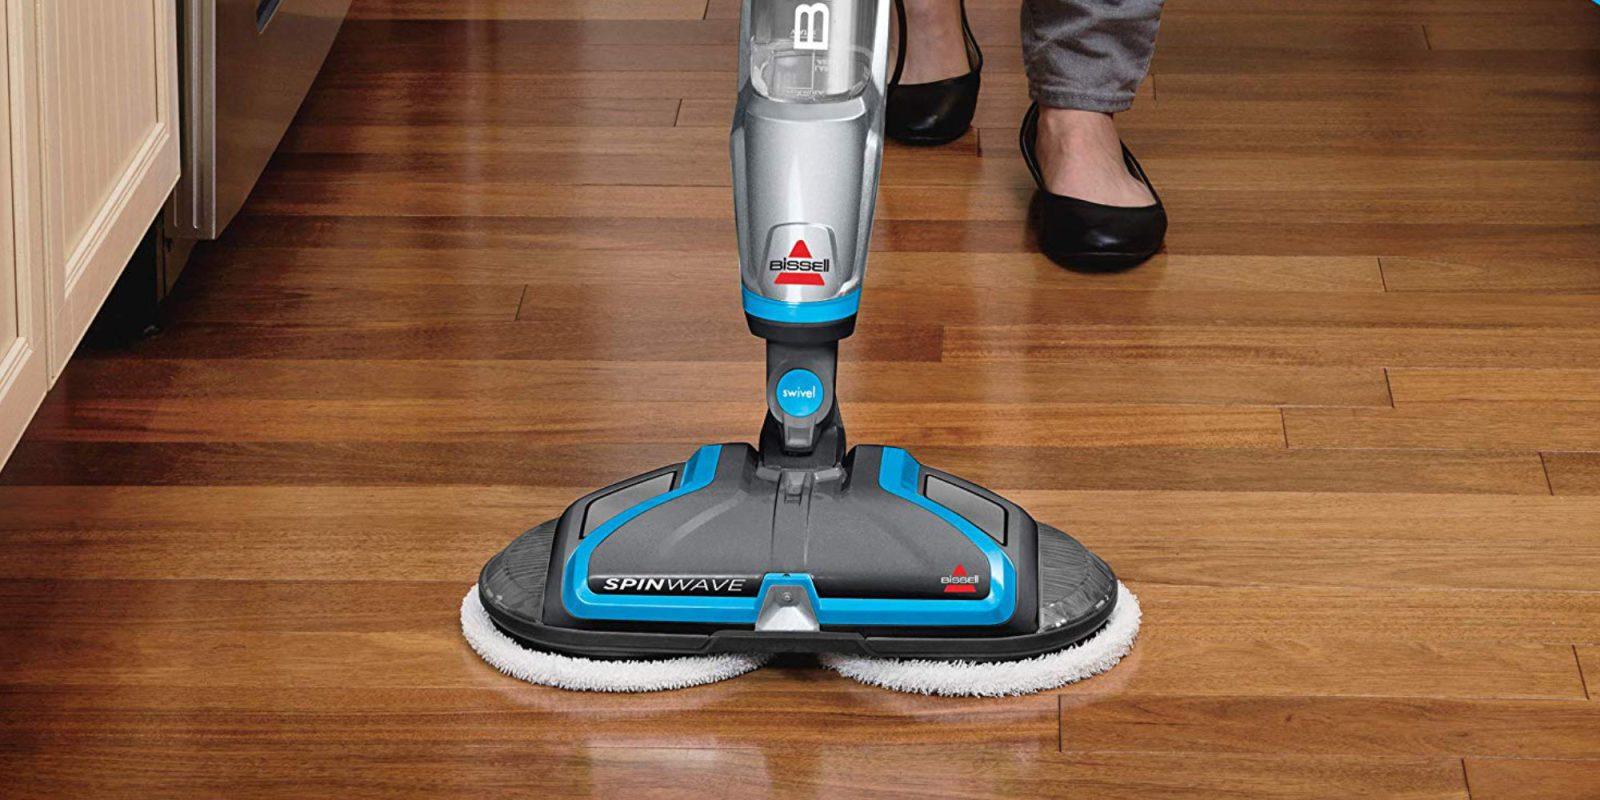 Make floors glimmer w/ Bissell's motorized Spinwave Plus Cleaner: $80 (Reg. $120)